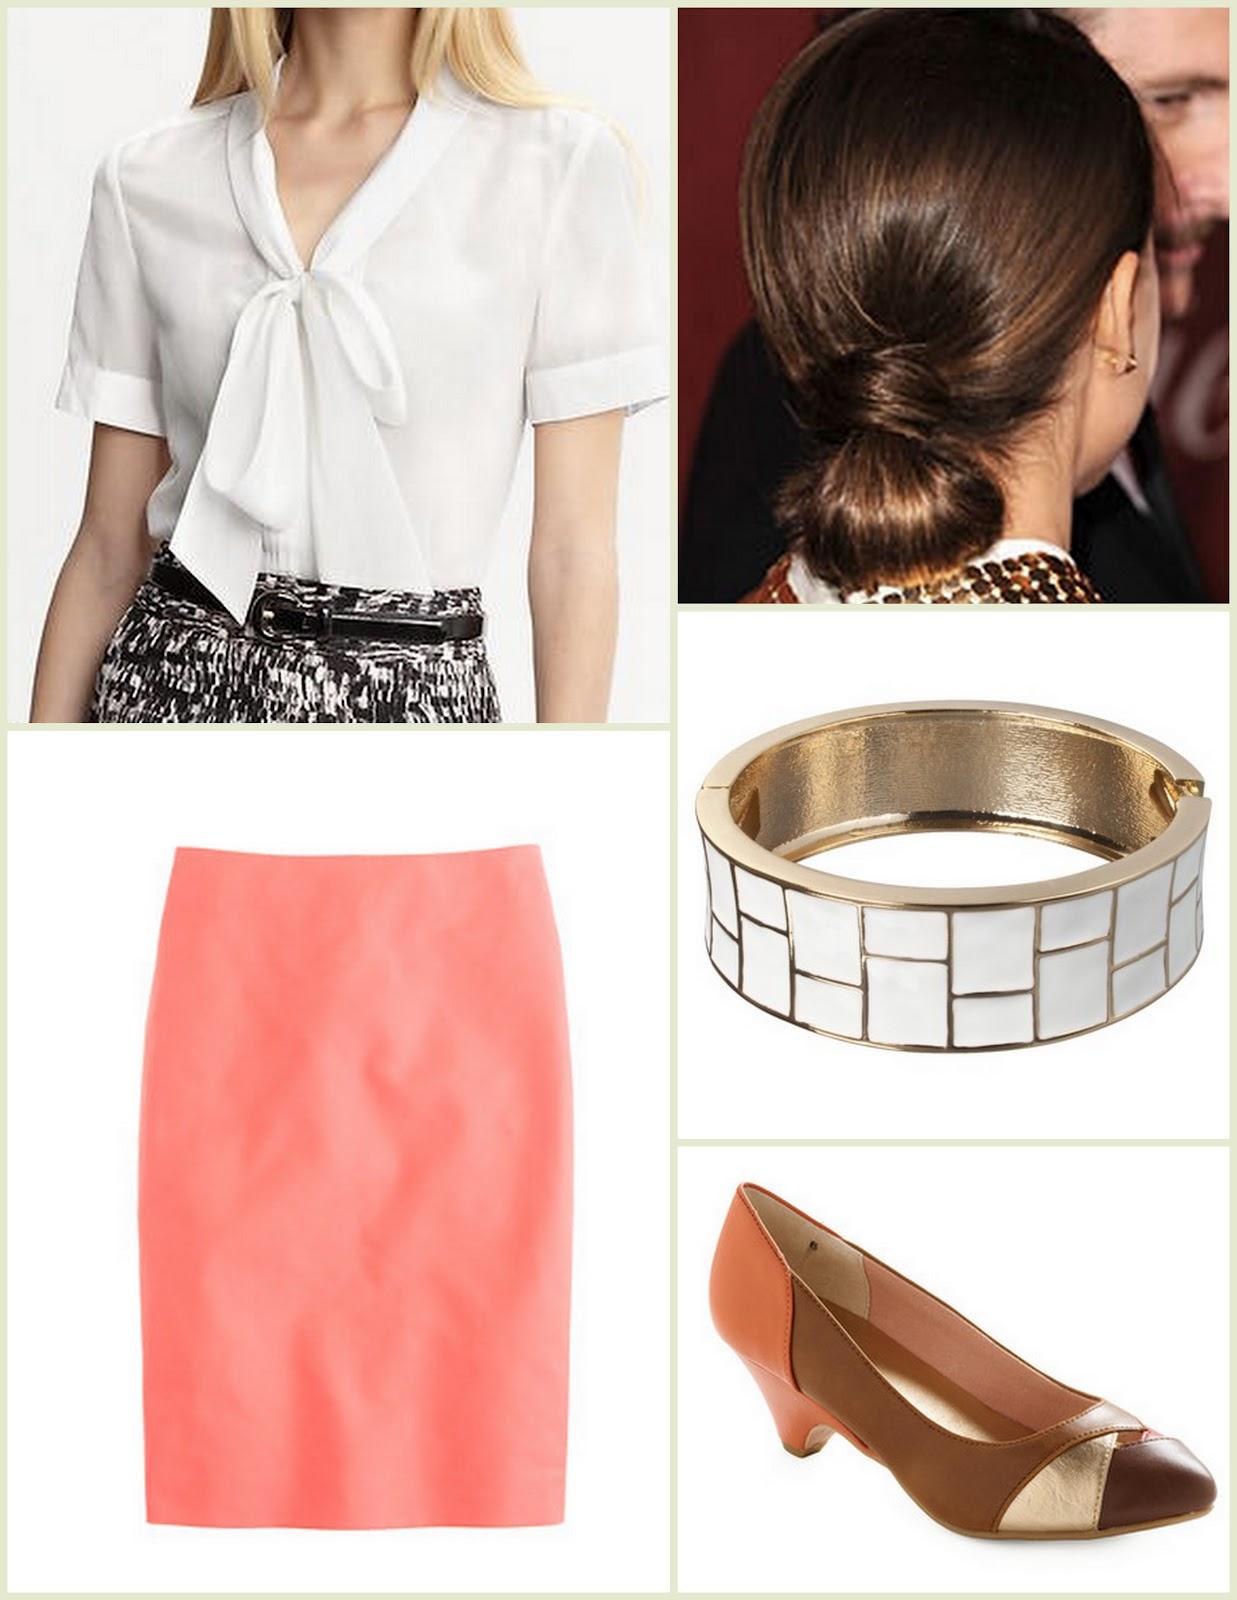 peach-pencil-skirt-white-top-blouse-bun-bracelet-cognac-shoe-pumps-spring-summer-hairr-work.jpg